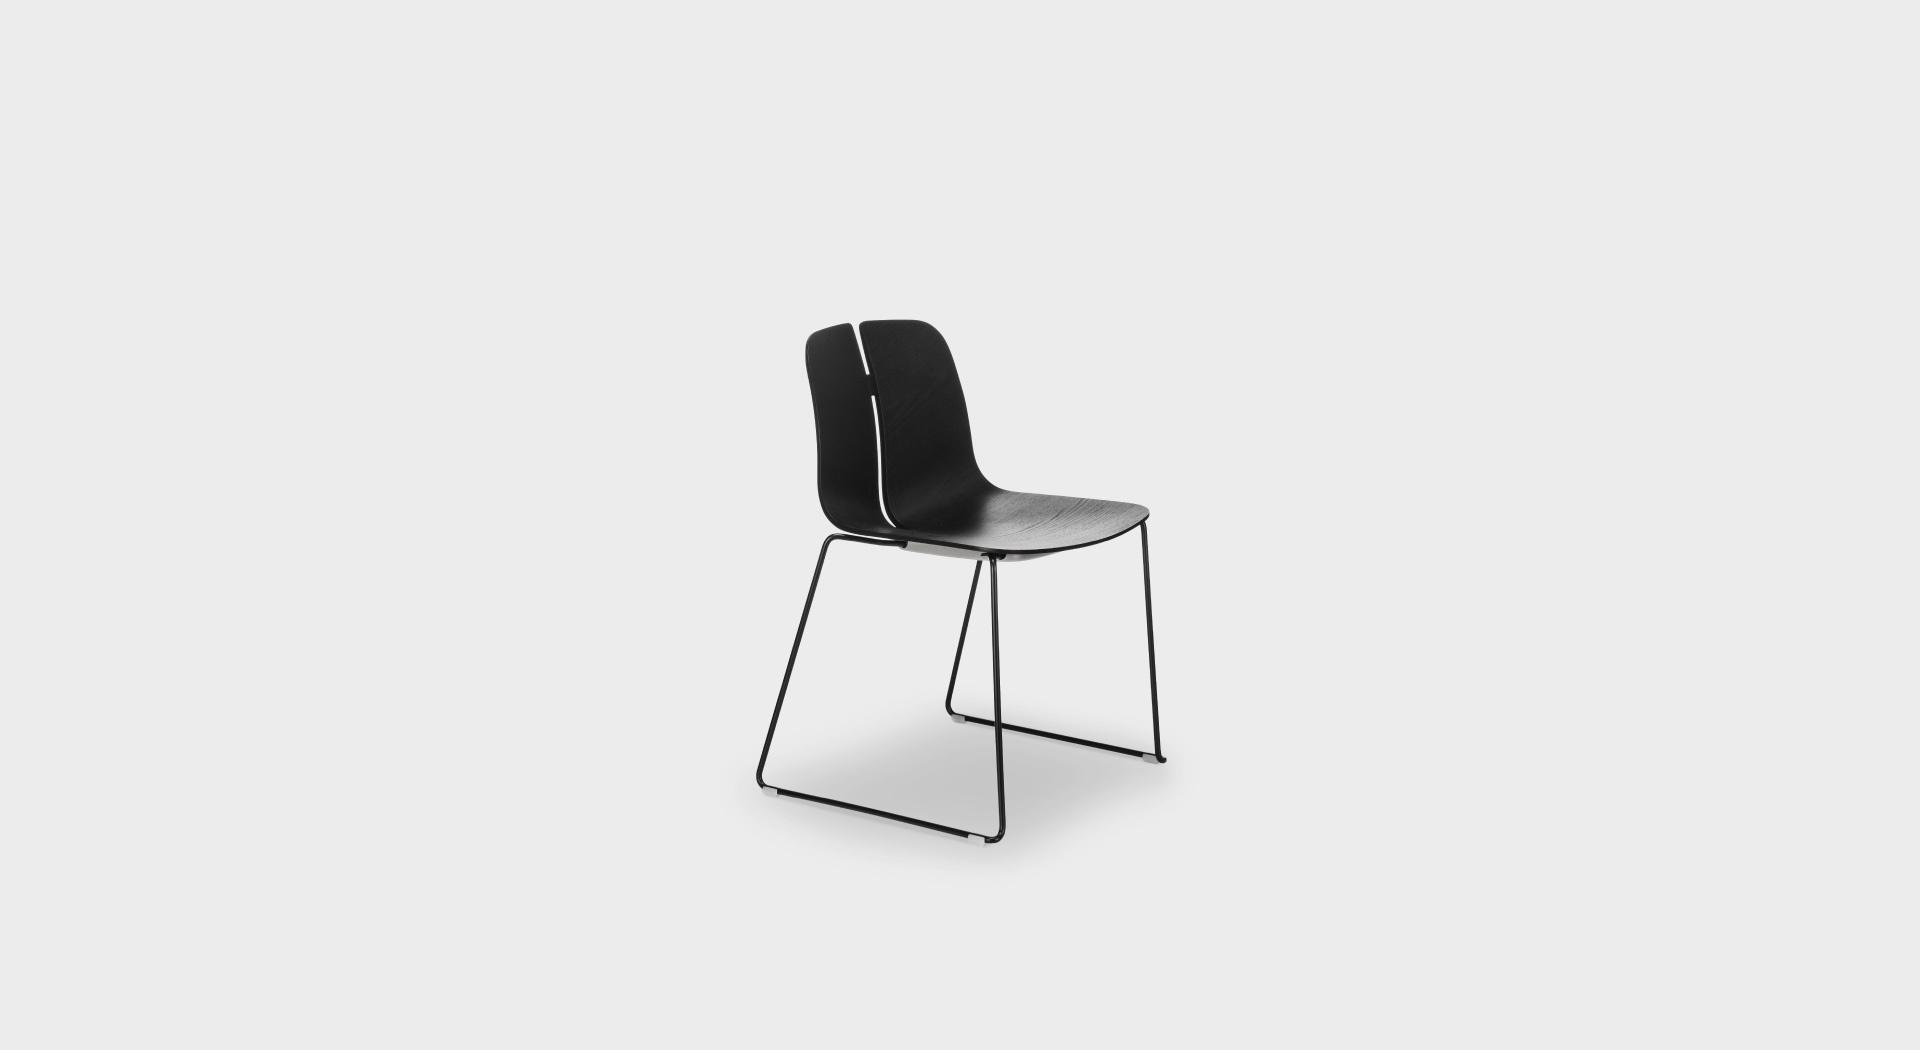 Sedie A Slitta Moderne.Link S124 Sedia Di Design Seduta In Legno E Gambe In Metallo